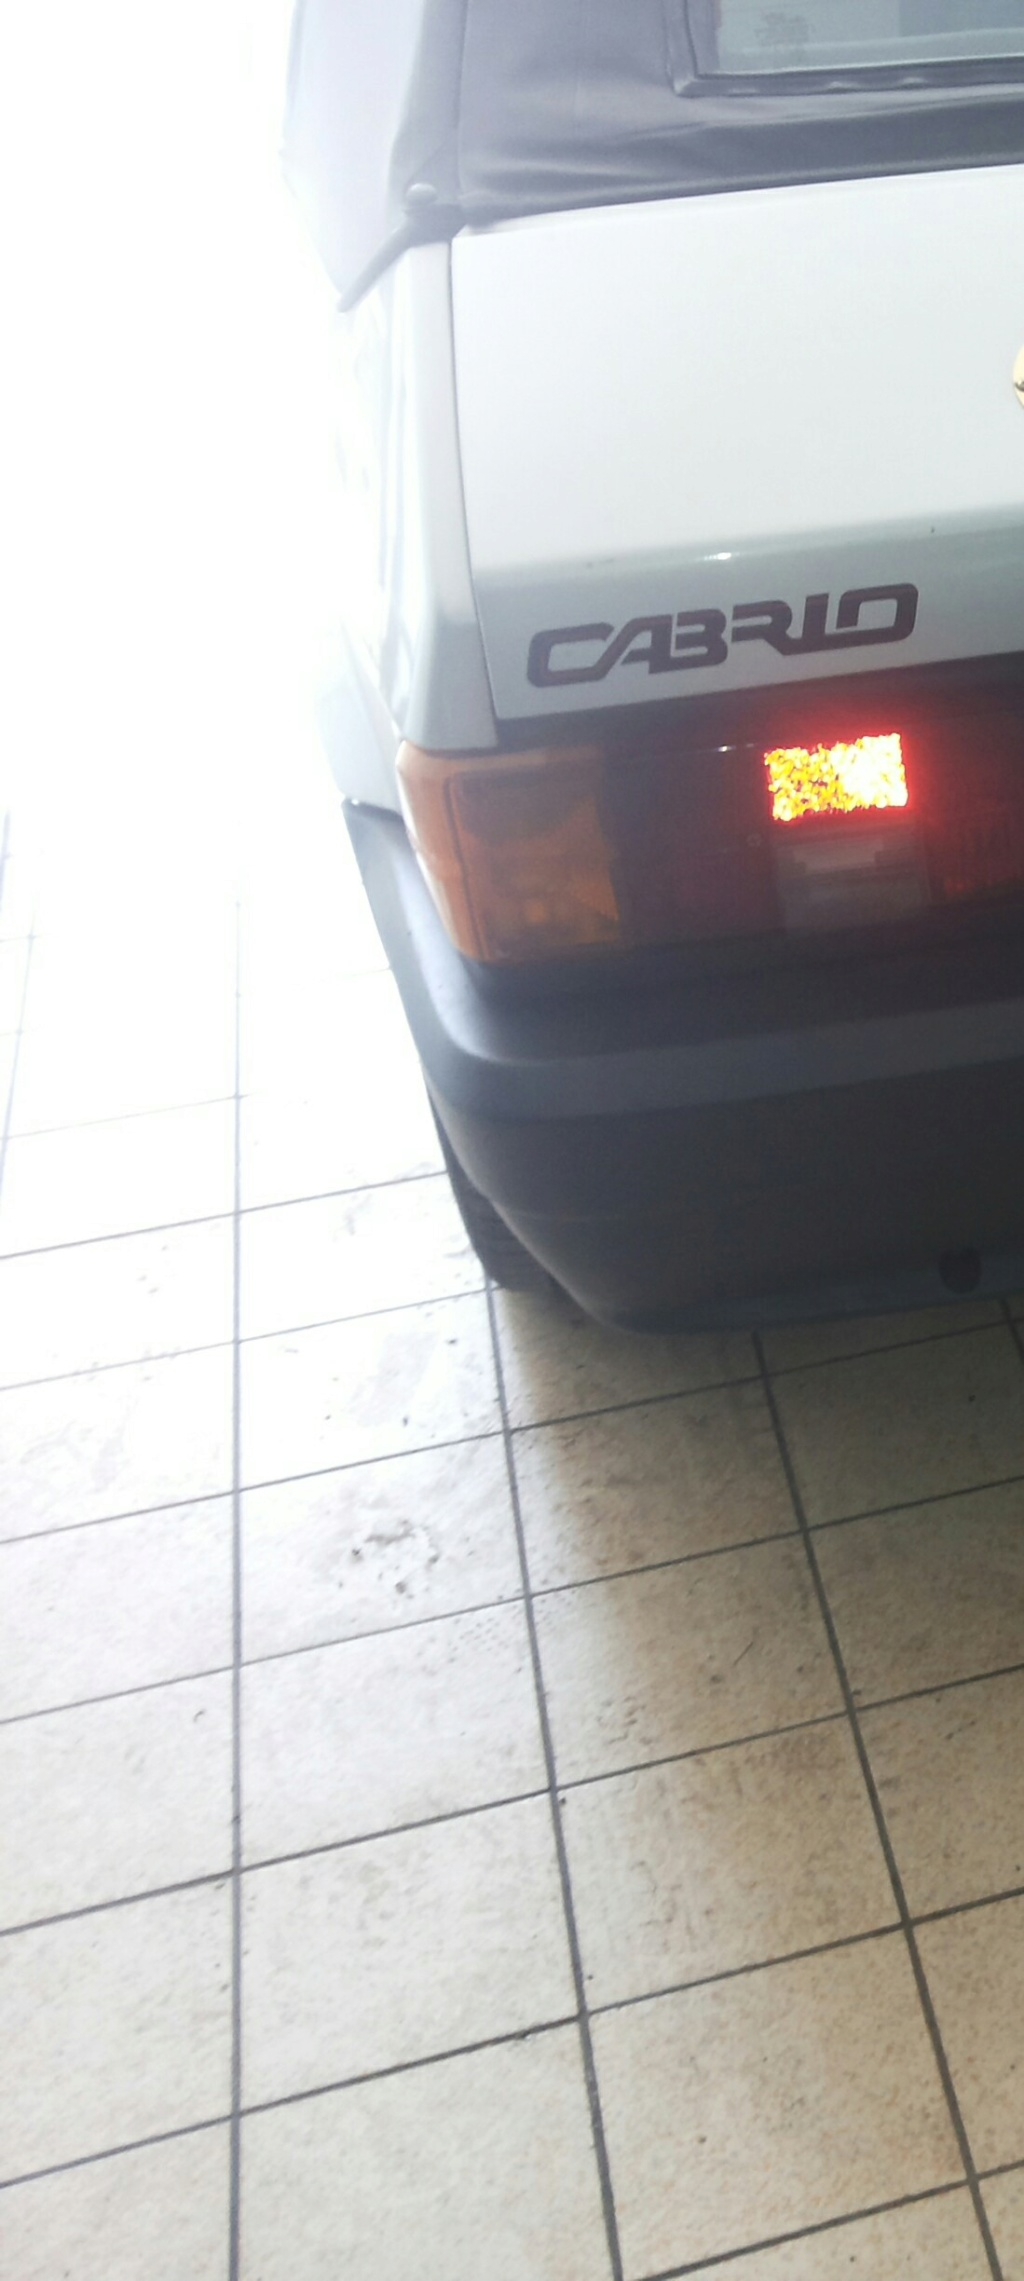 Adesivo baule posteriore Cabrio J6ipjn10